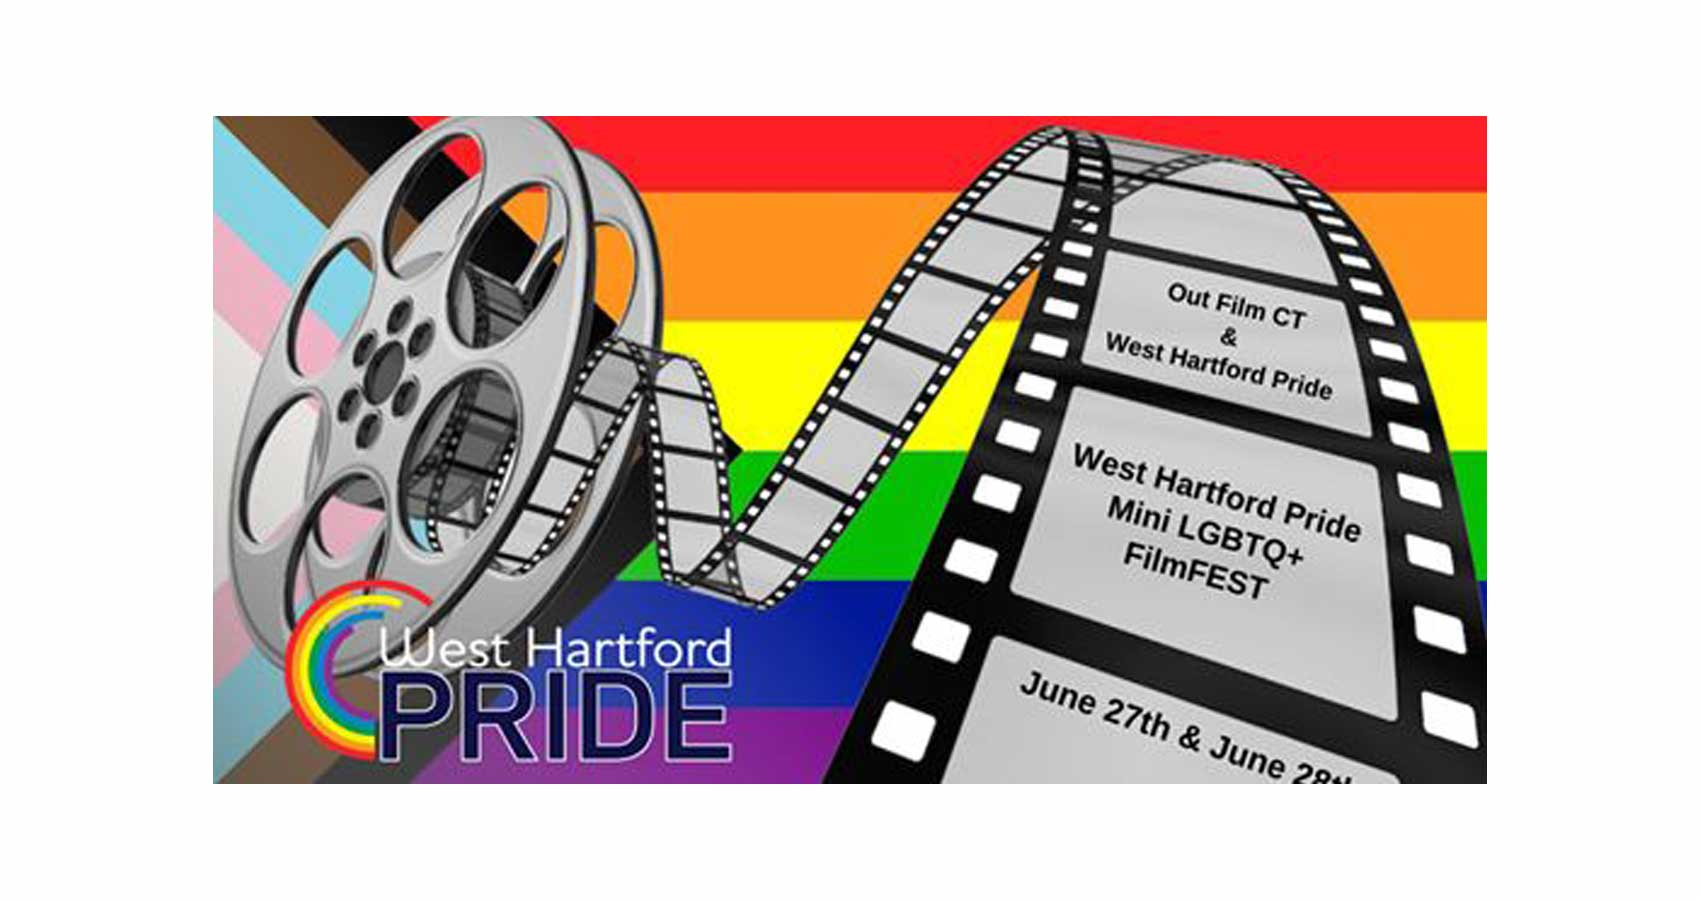 West Hartford Pride Film Fest